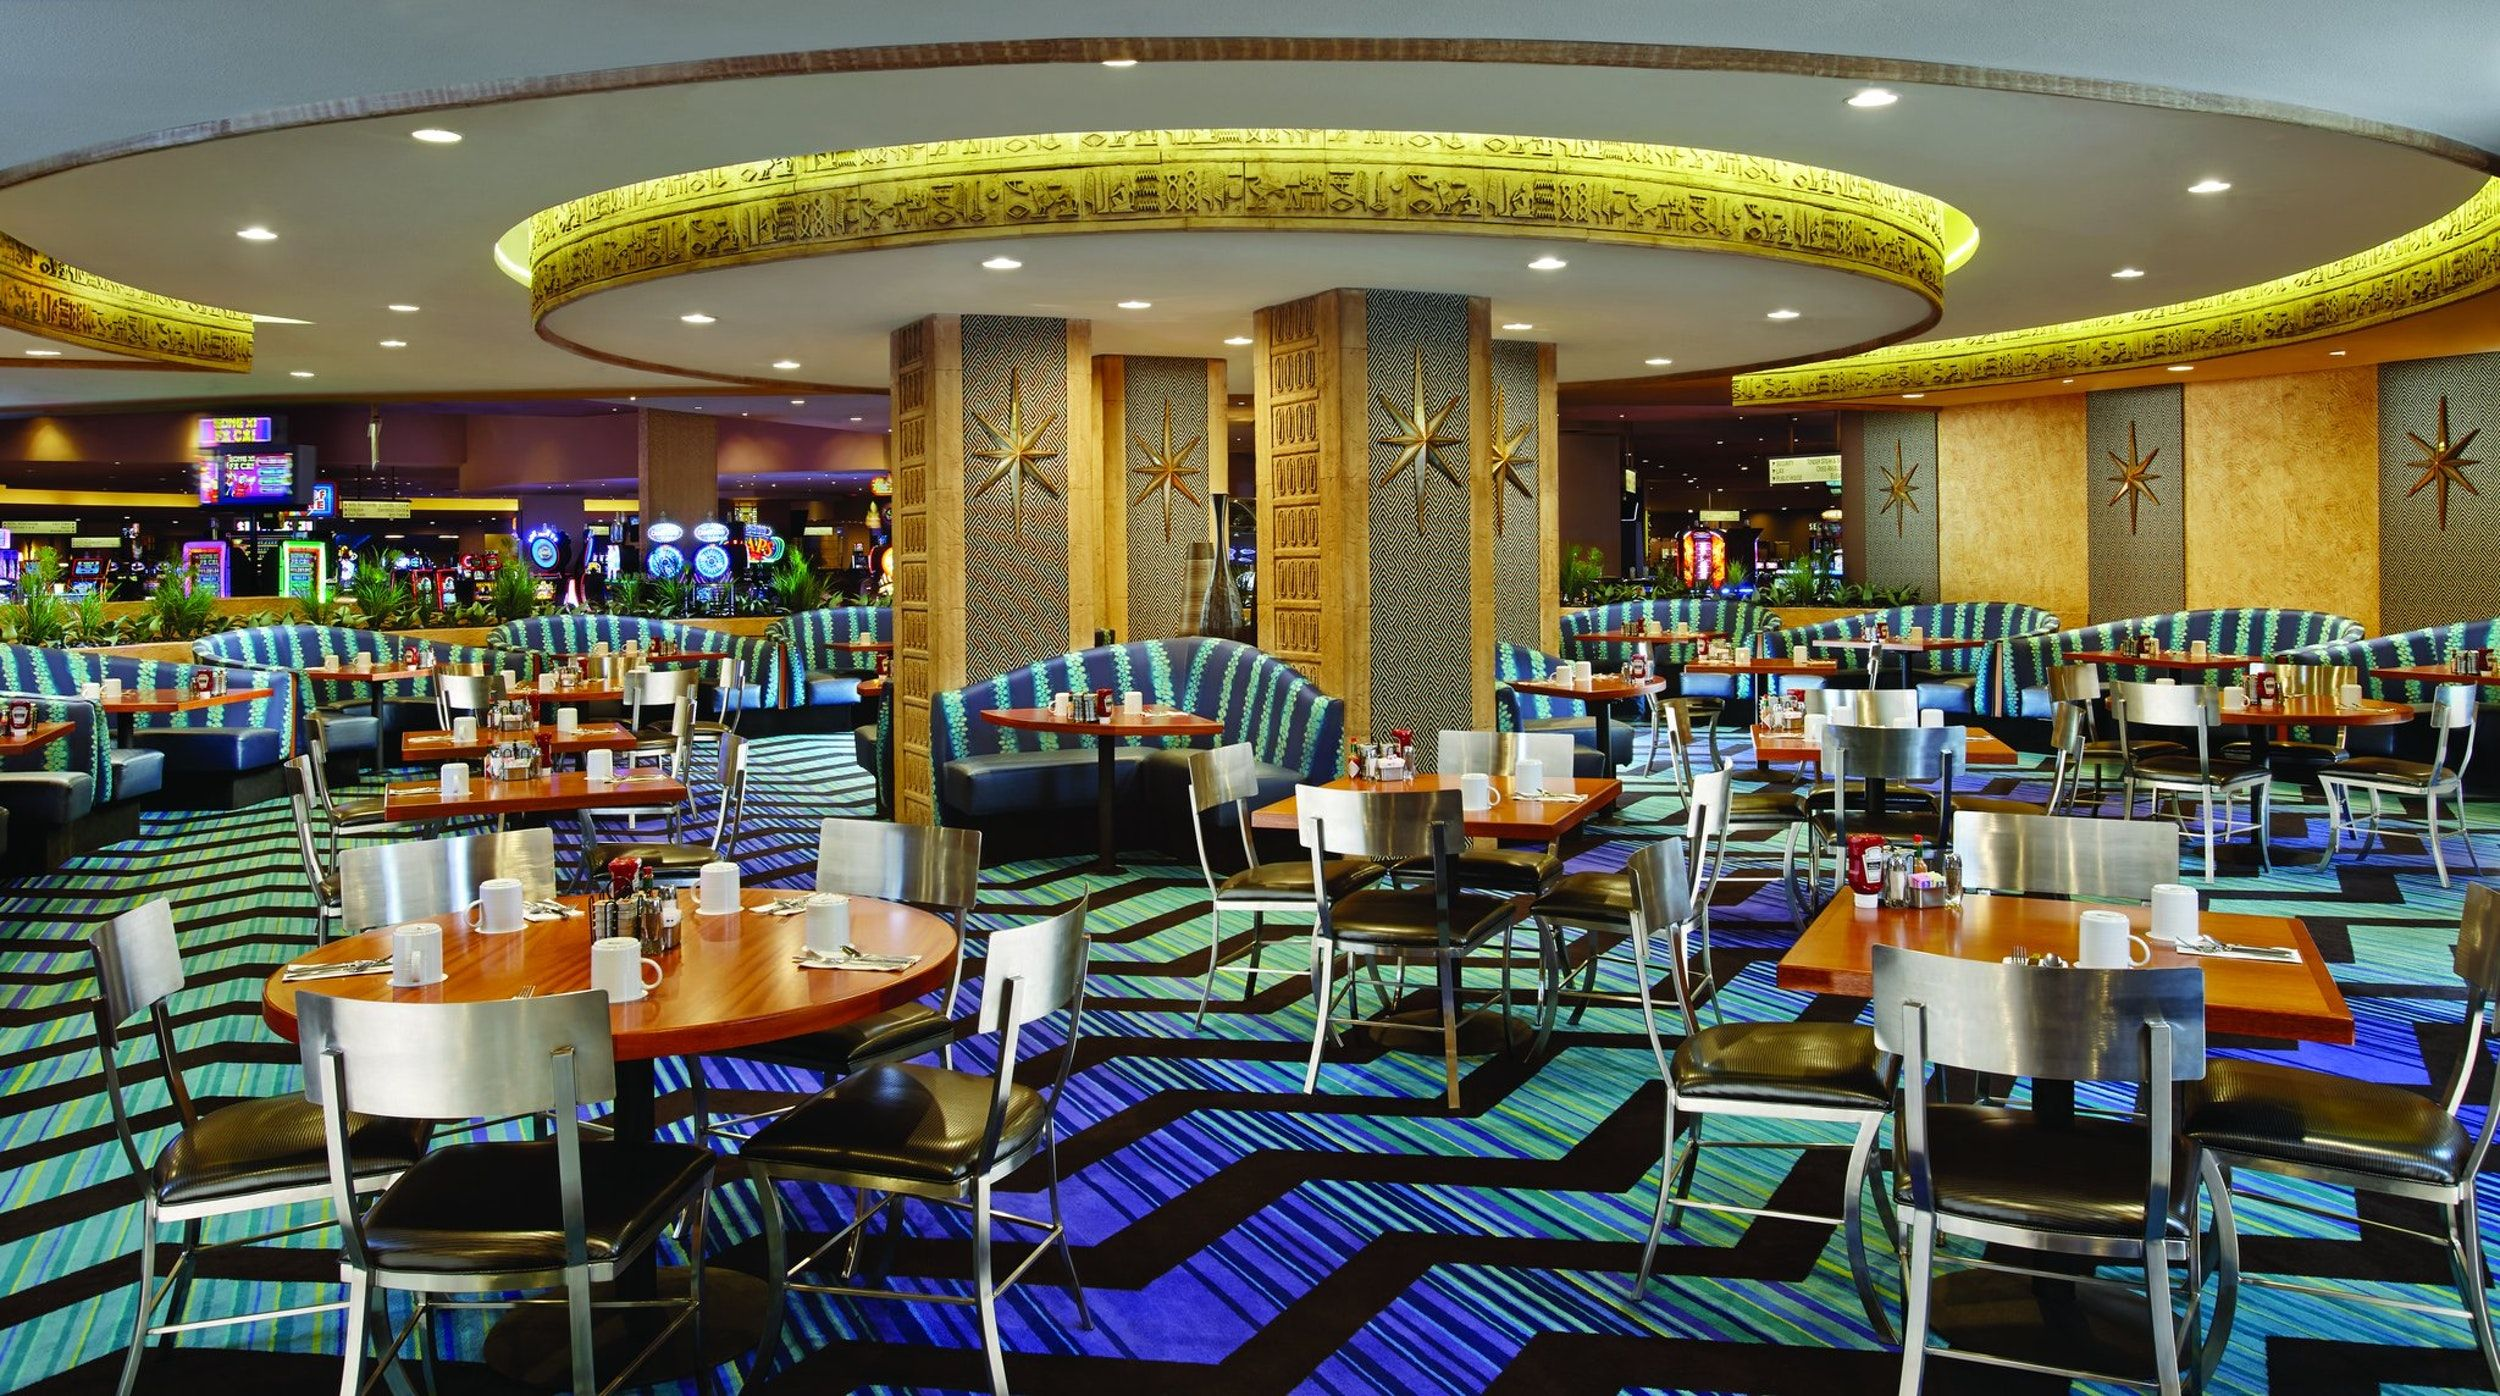 Pyramid Cafe Suites at Luxor Hotel & Casino Hotel, Las